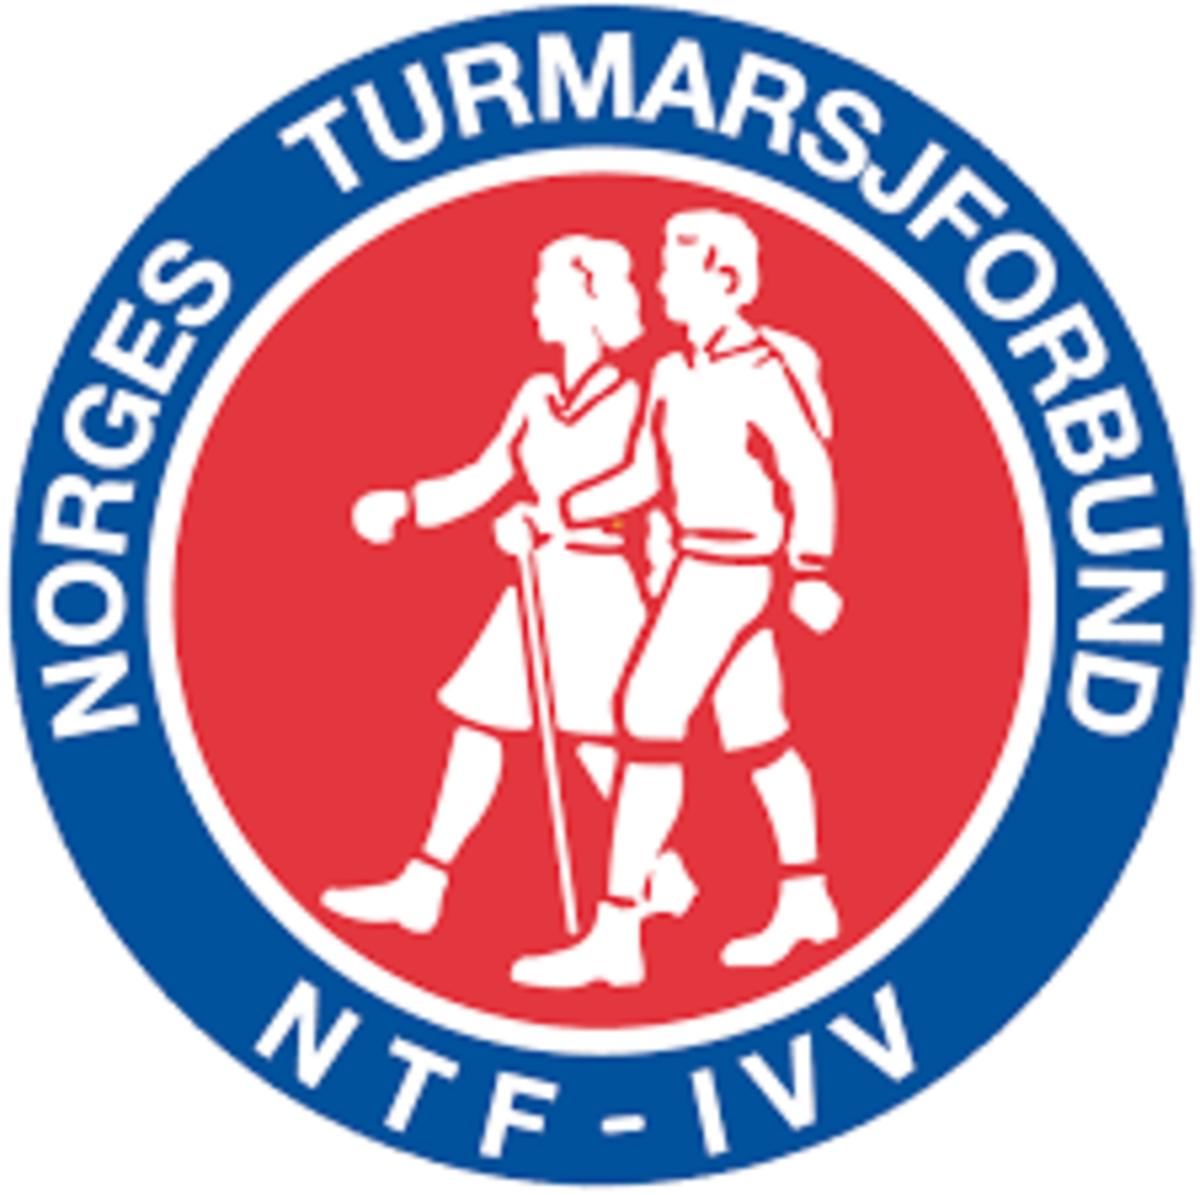 Profilbilde for Norges Turmarsjforbund